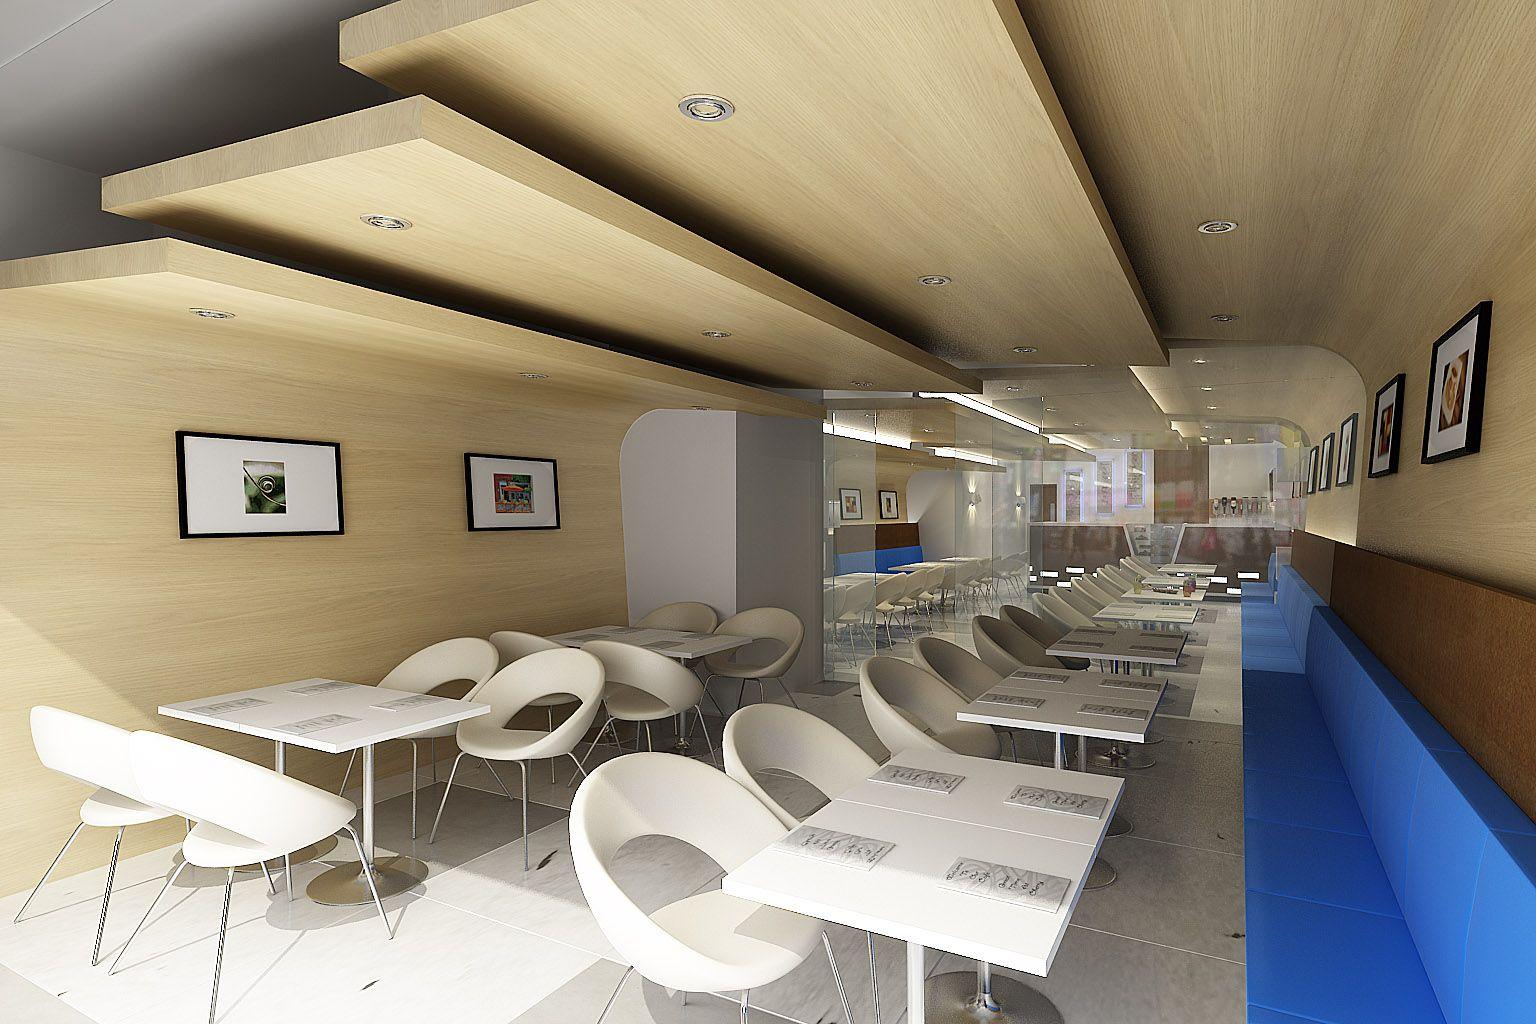 b03618efed5896c055f25c2397e9704c Lobby Ceiling Lighting Ideas on office lighting ideas, lobby ceiling lighting strategies, lobby design ideas, lobby lighting fixtures, lobby decorating ideas, lobby wall ideas, lobby furniture ideas,